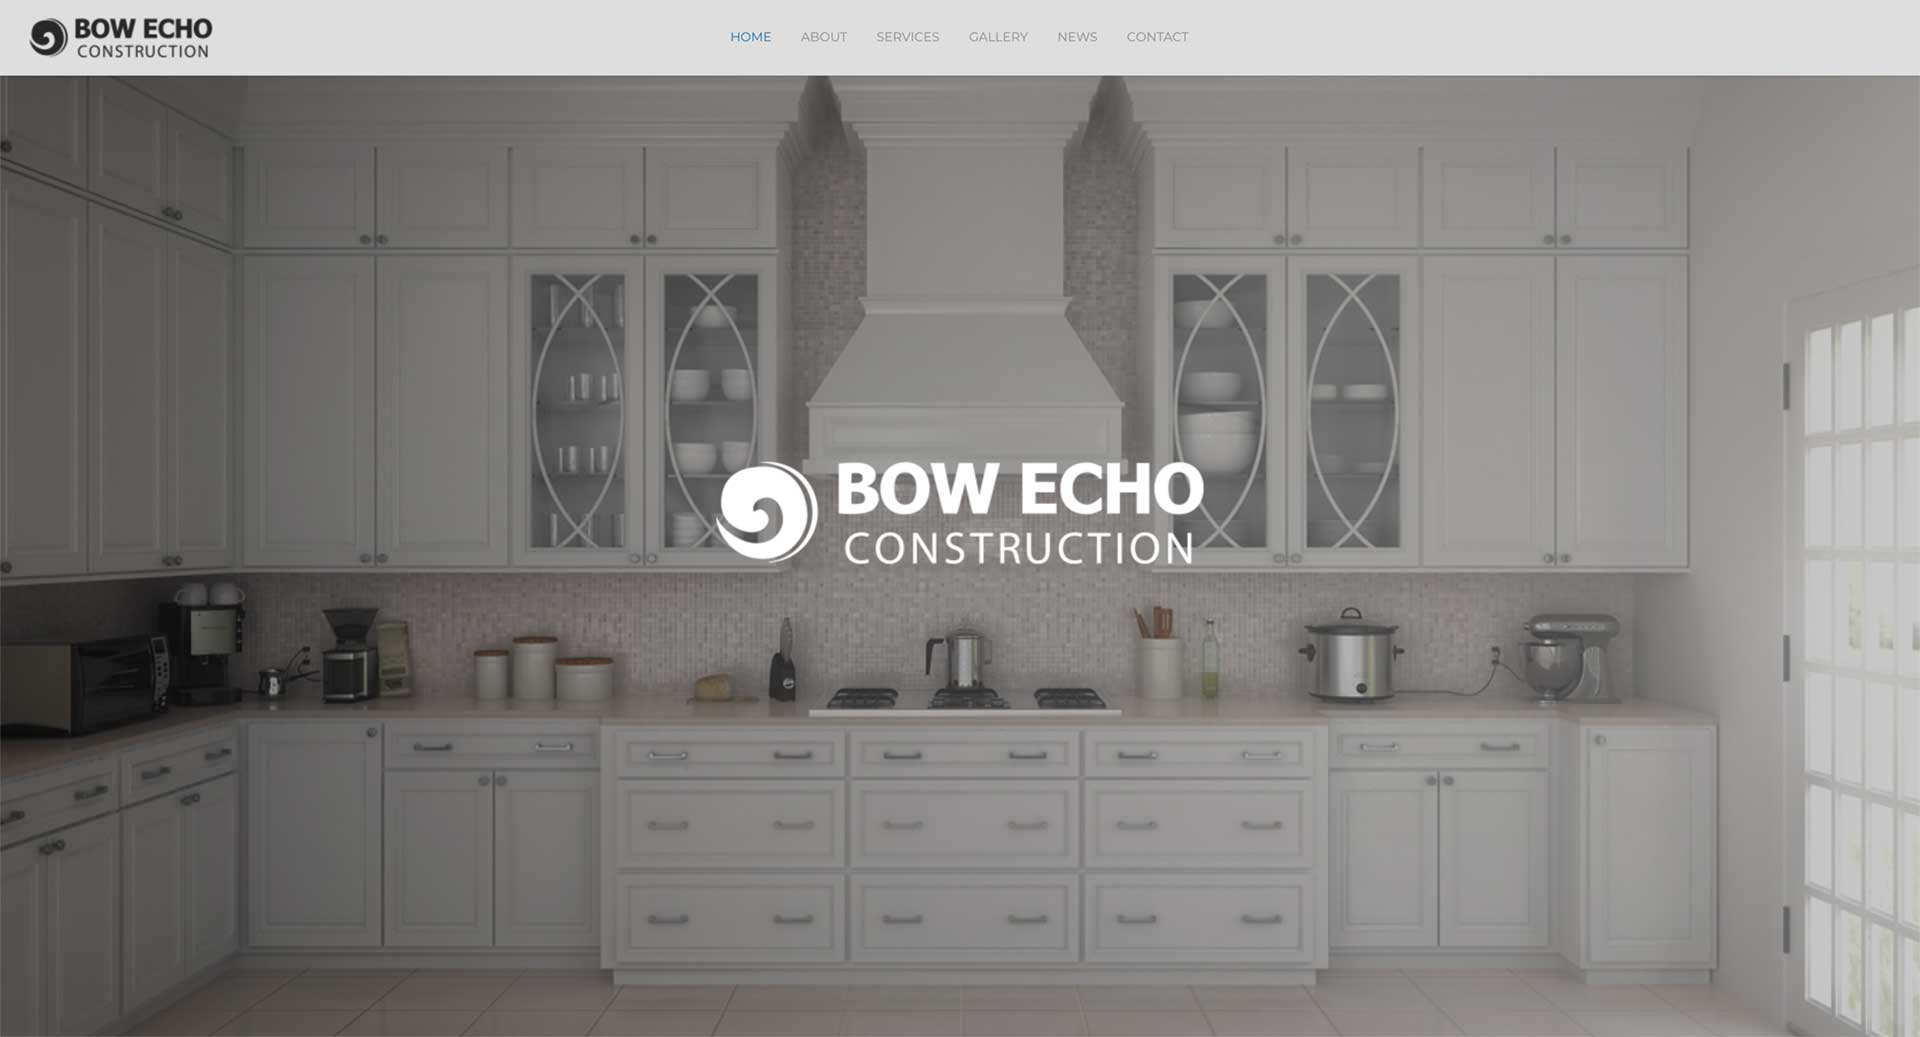 Bow Echo Construction website